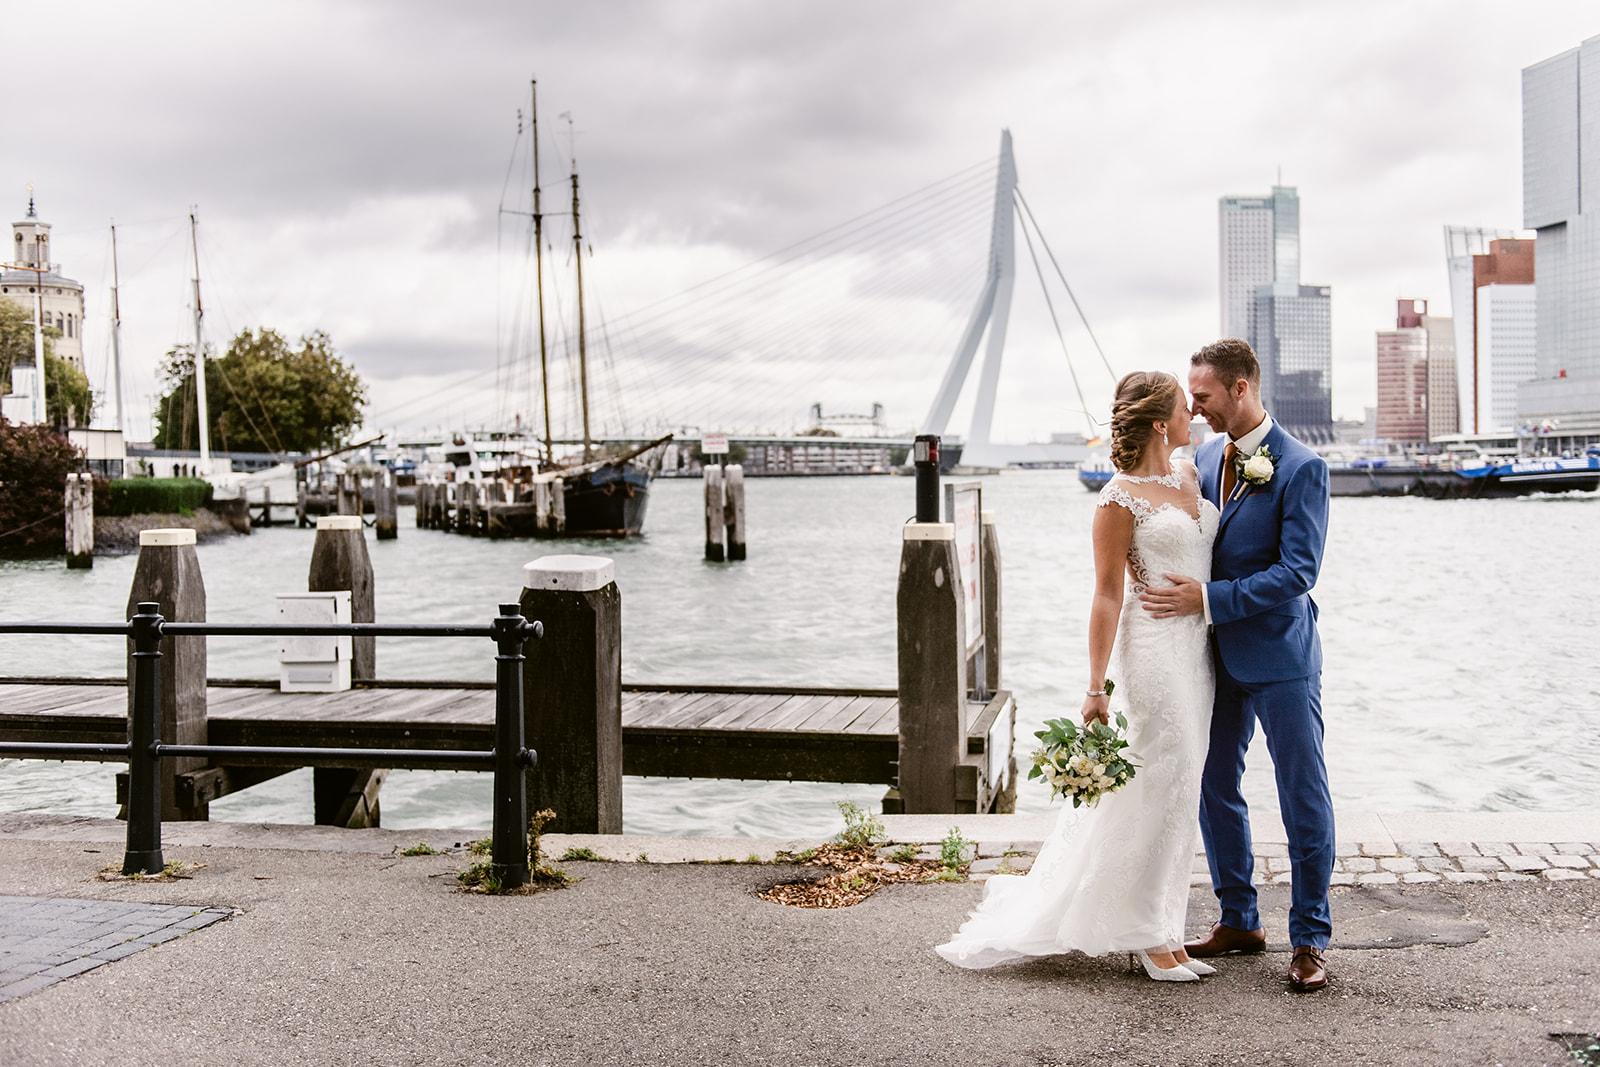 Trouwfotograaf Westerkade Rotterdam | | © Debby Elemans Photography